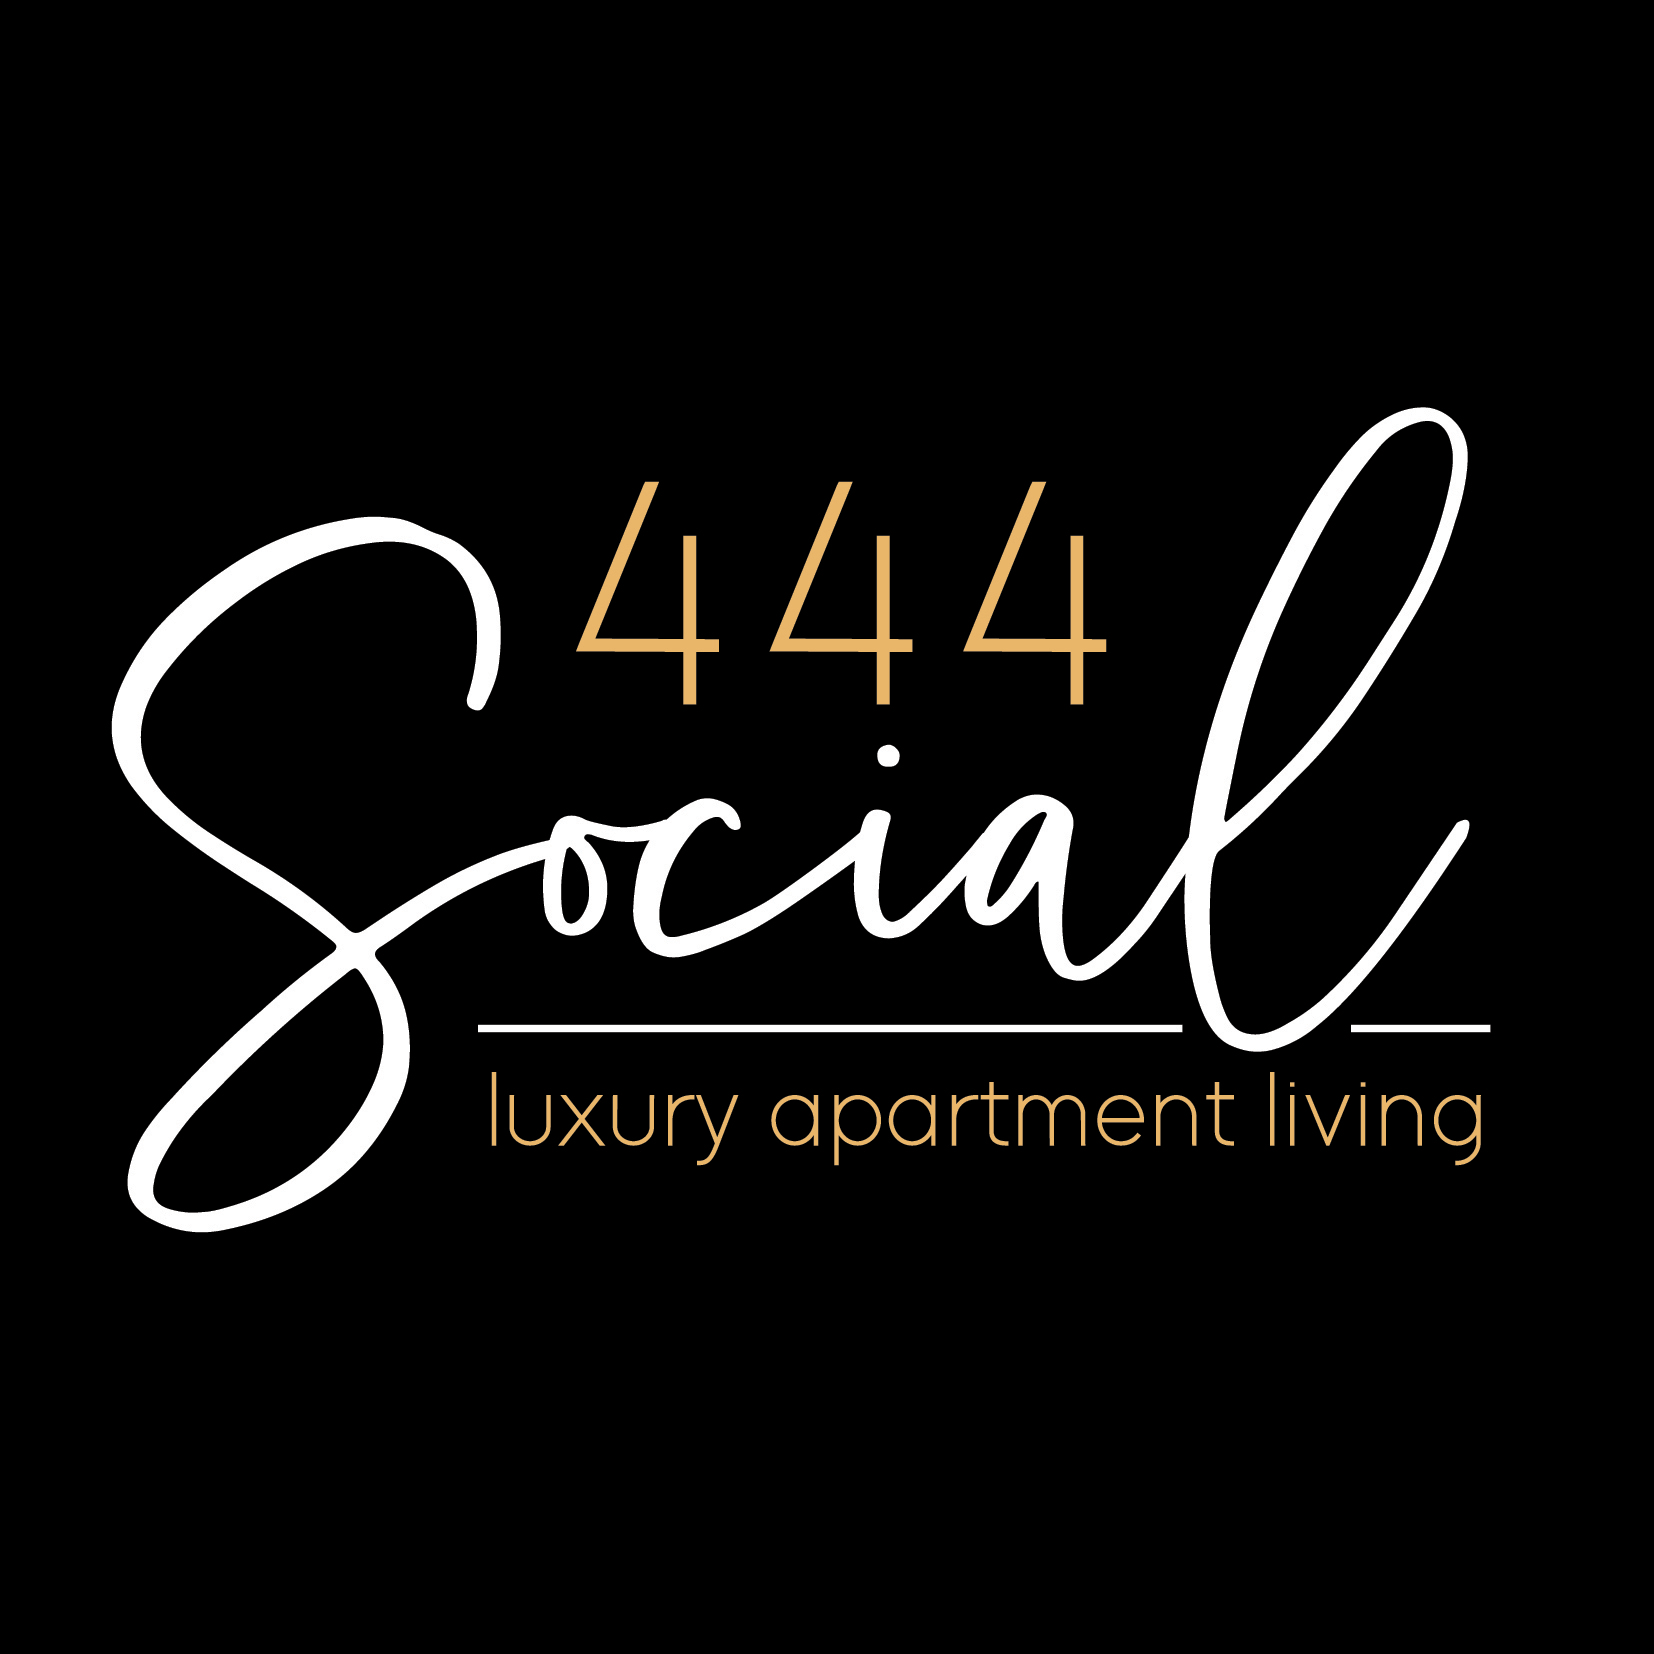 444 Social image 55